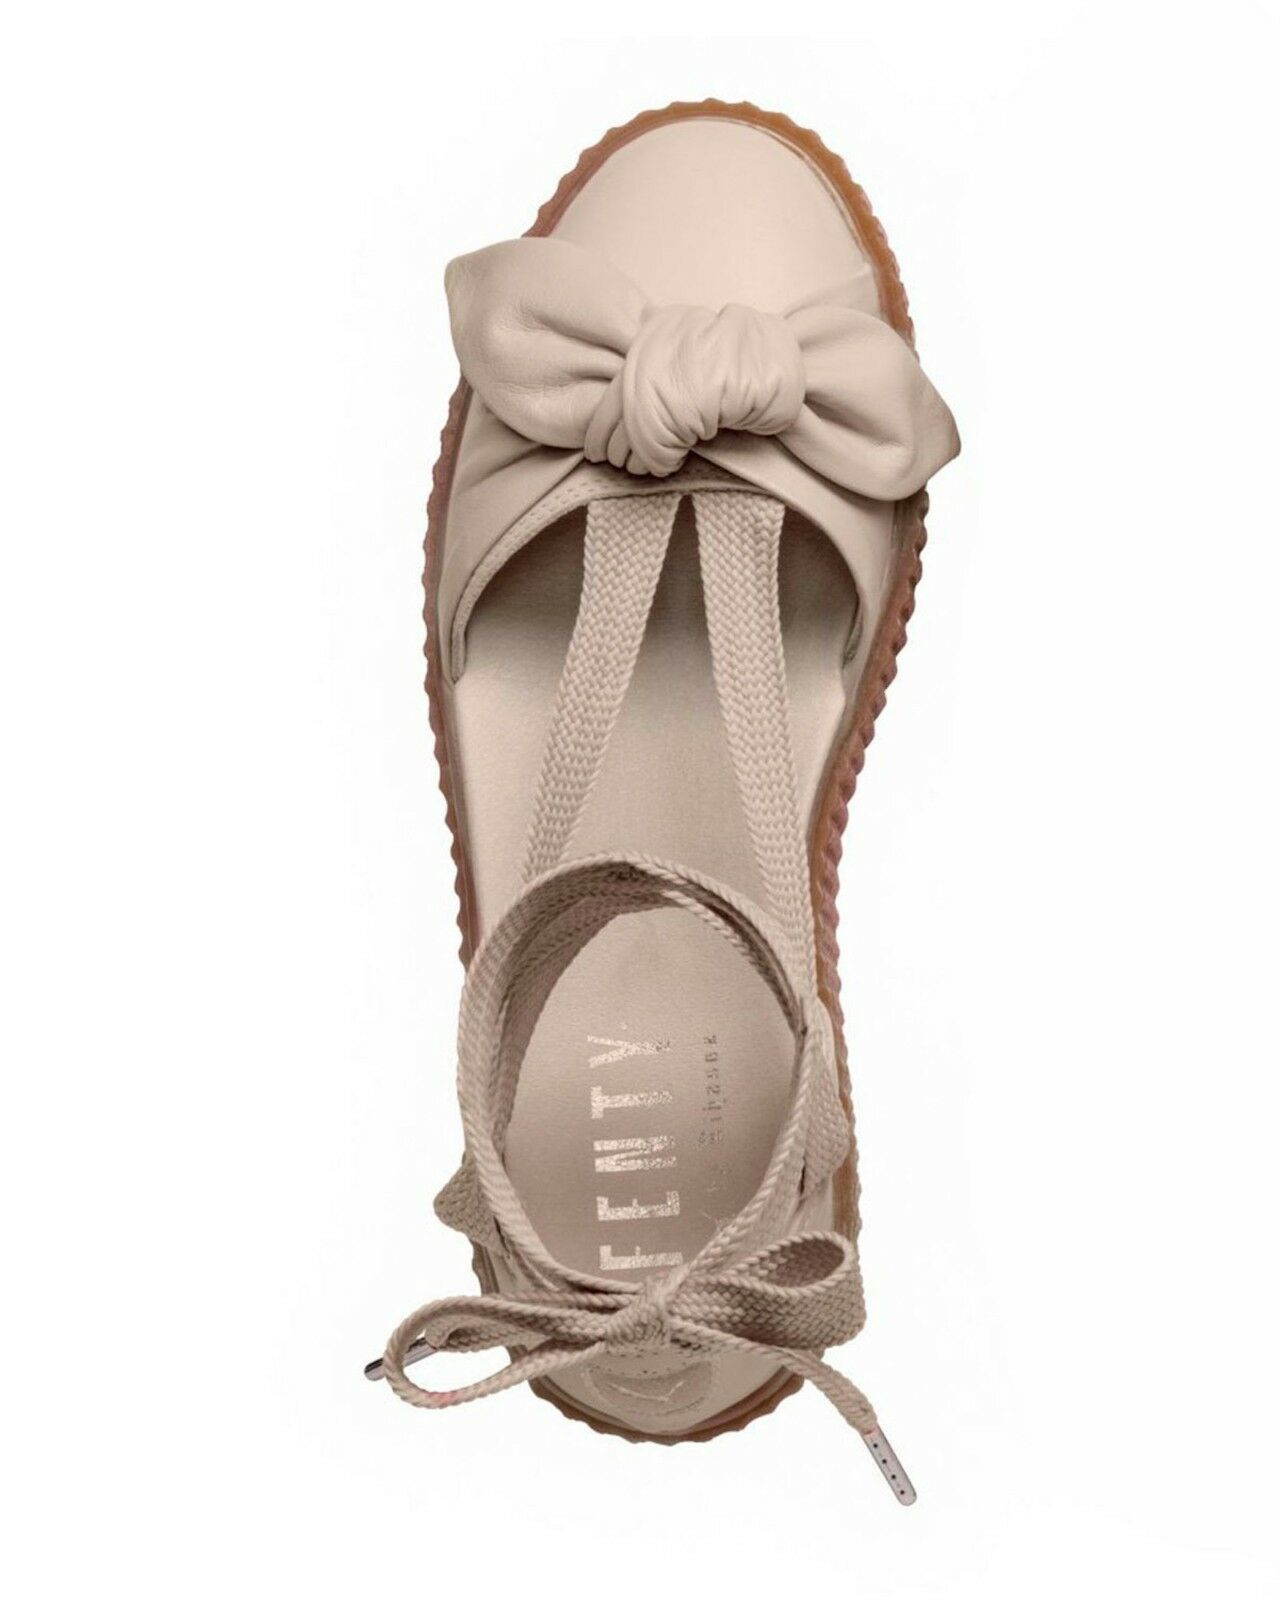 Fenty Puma by Rihanna Leather Bow Creeper Sandal Oatmeal Sz 9.5 140 NEW